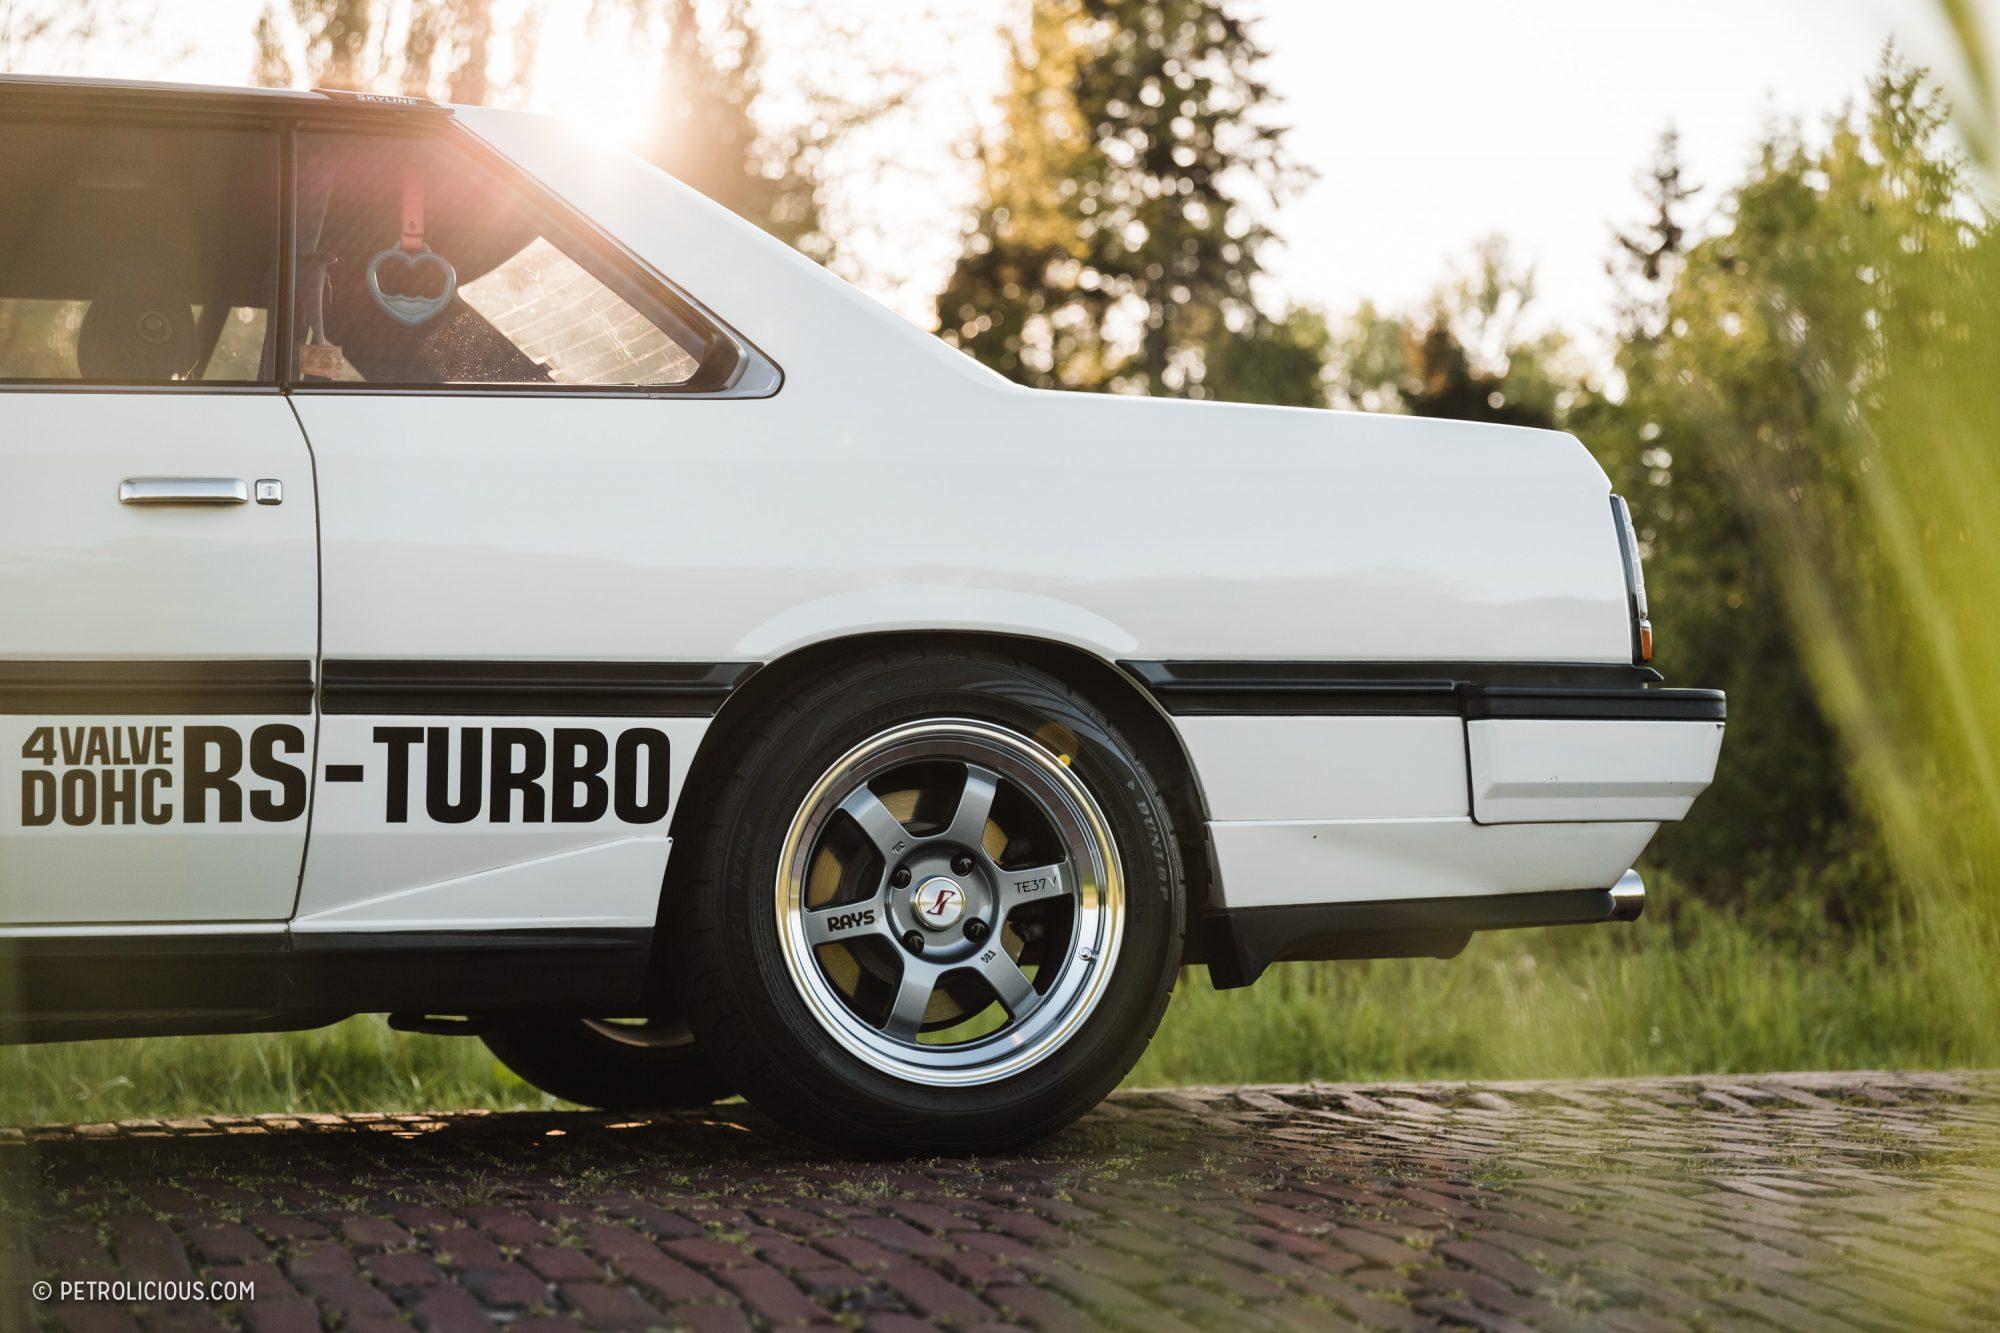 Мечта JDM культуры - Nissan Skyline RS-Turbo, 1983